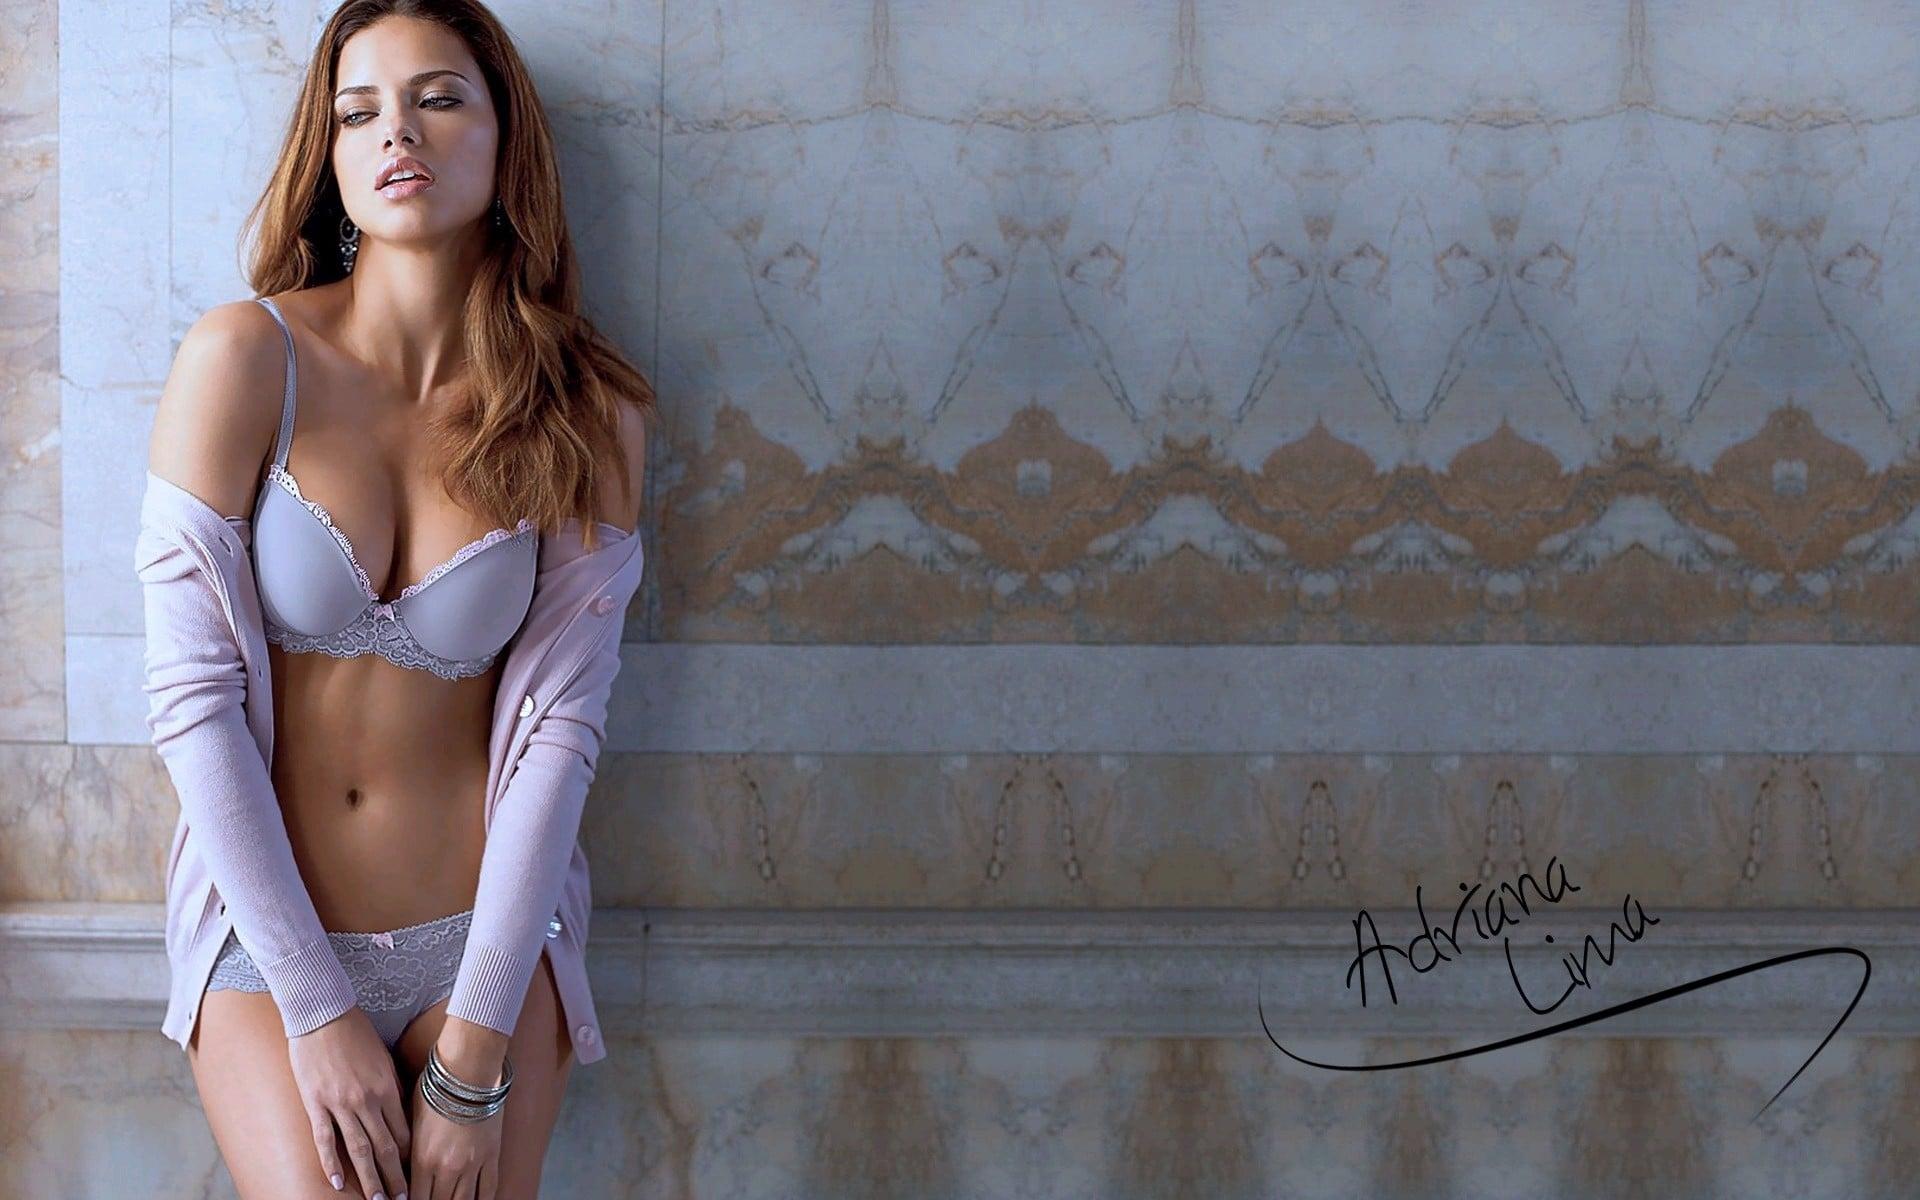 Top 10 beautiful women in the World, Adriana lima